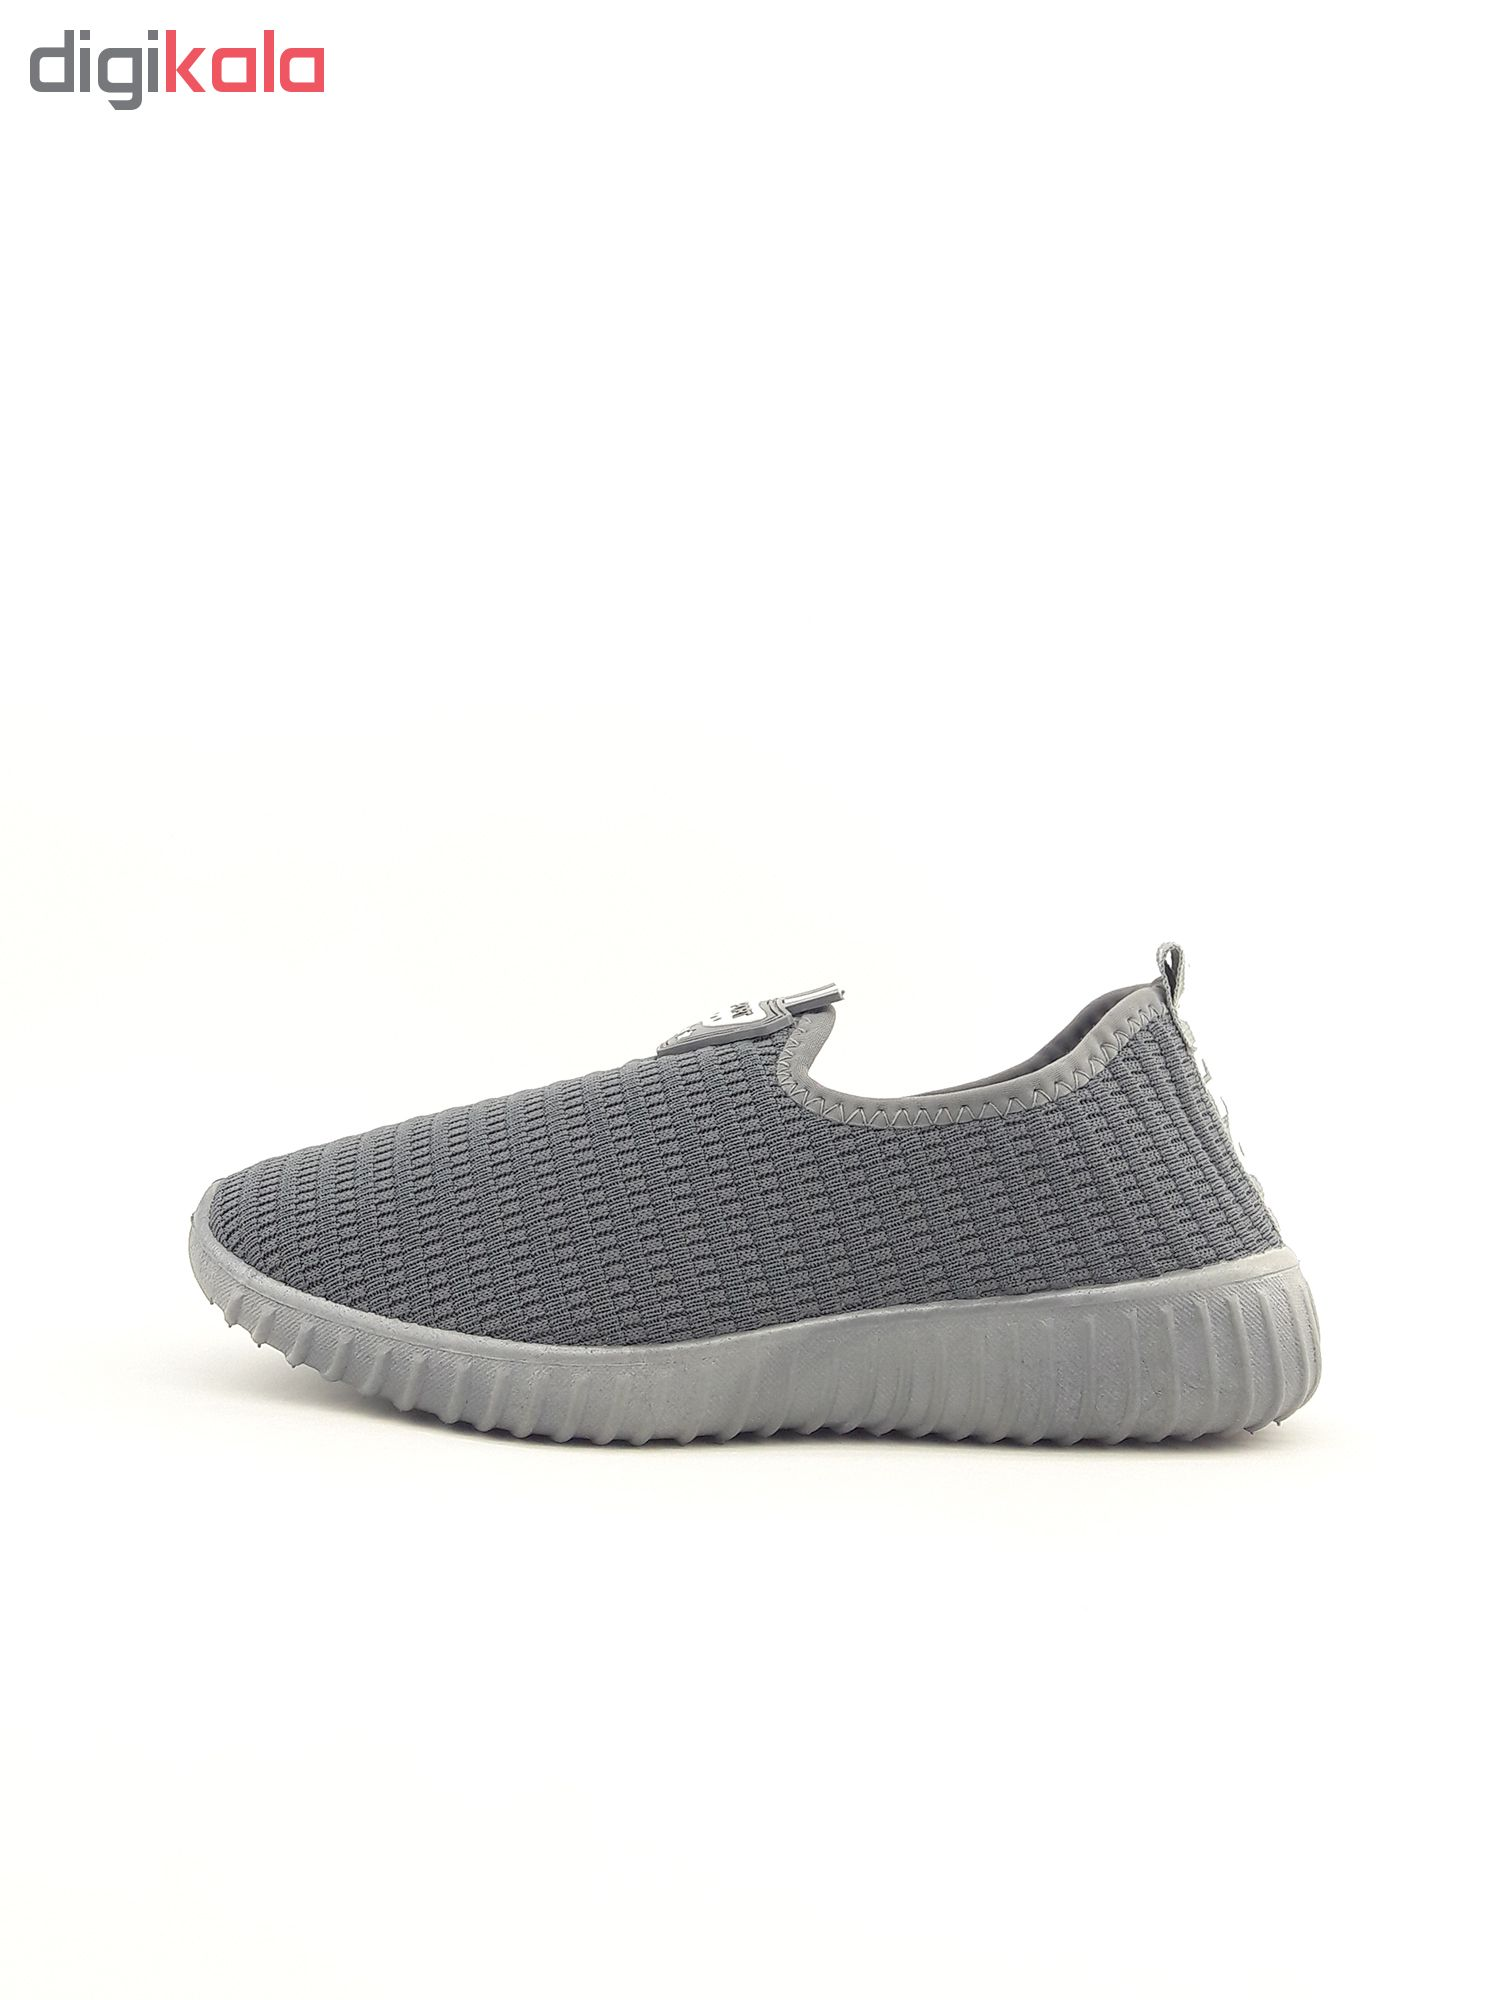 کفش راحتی زنانه اسپرت مدل Lovel gry.01